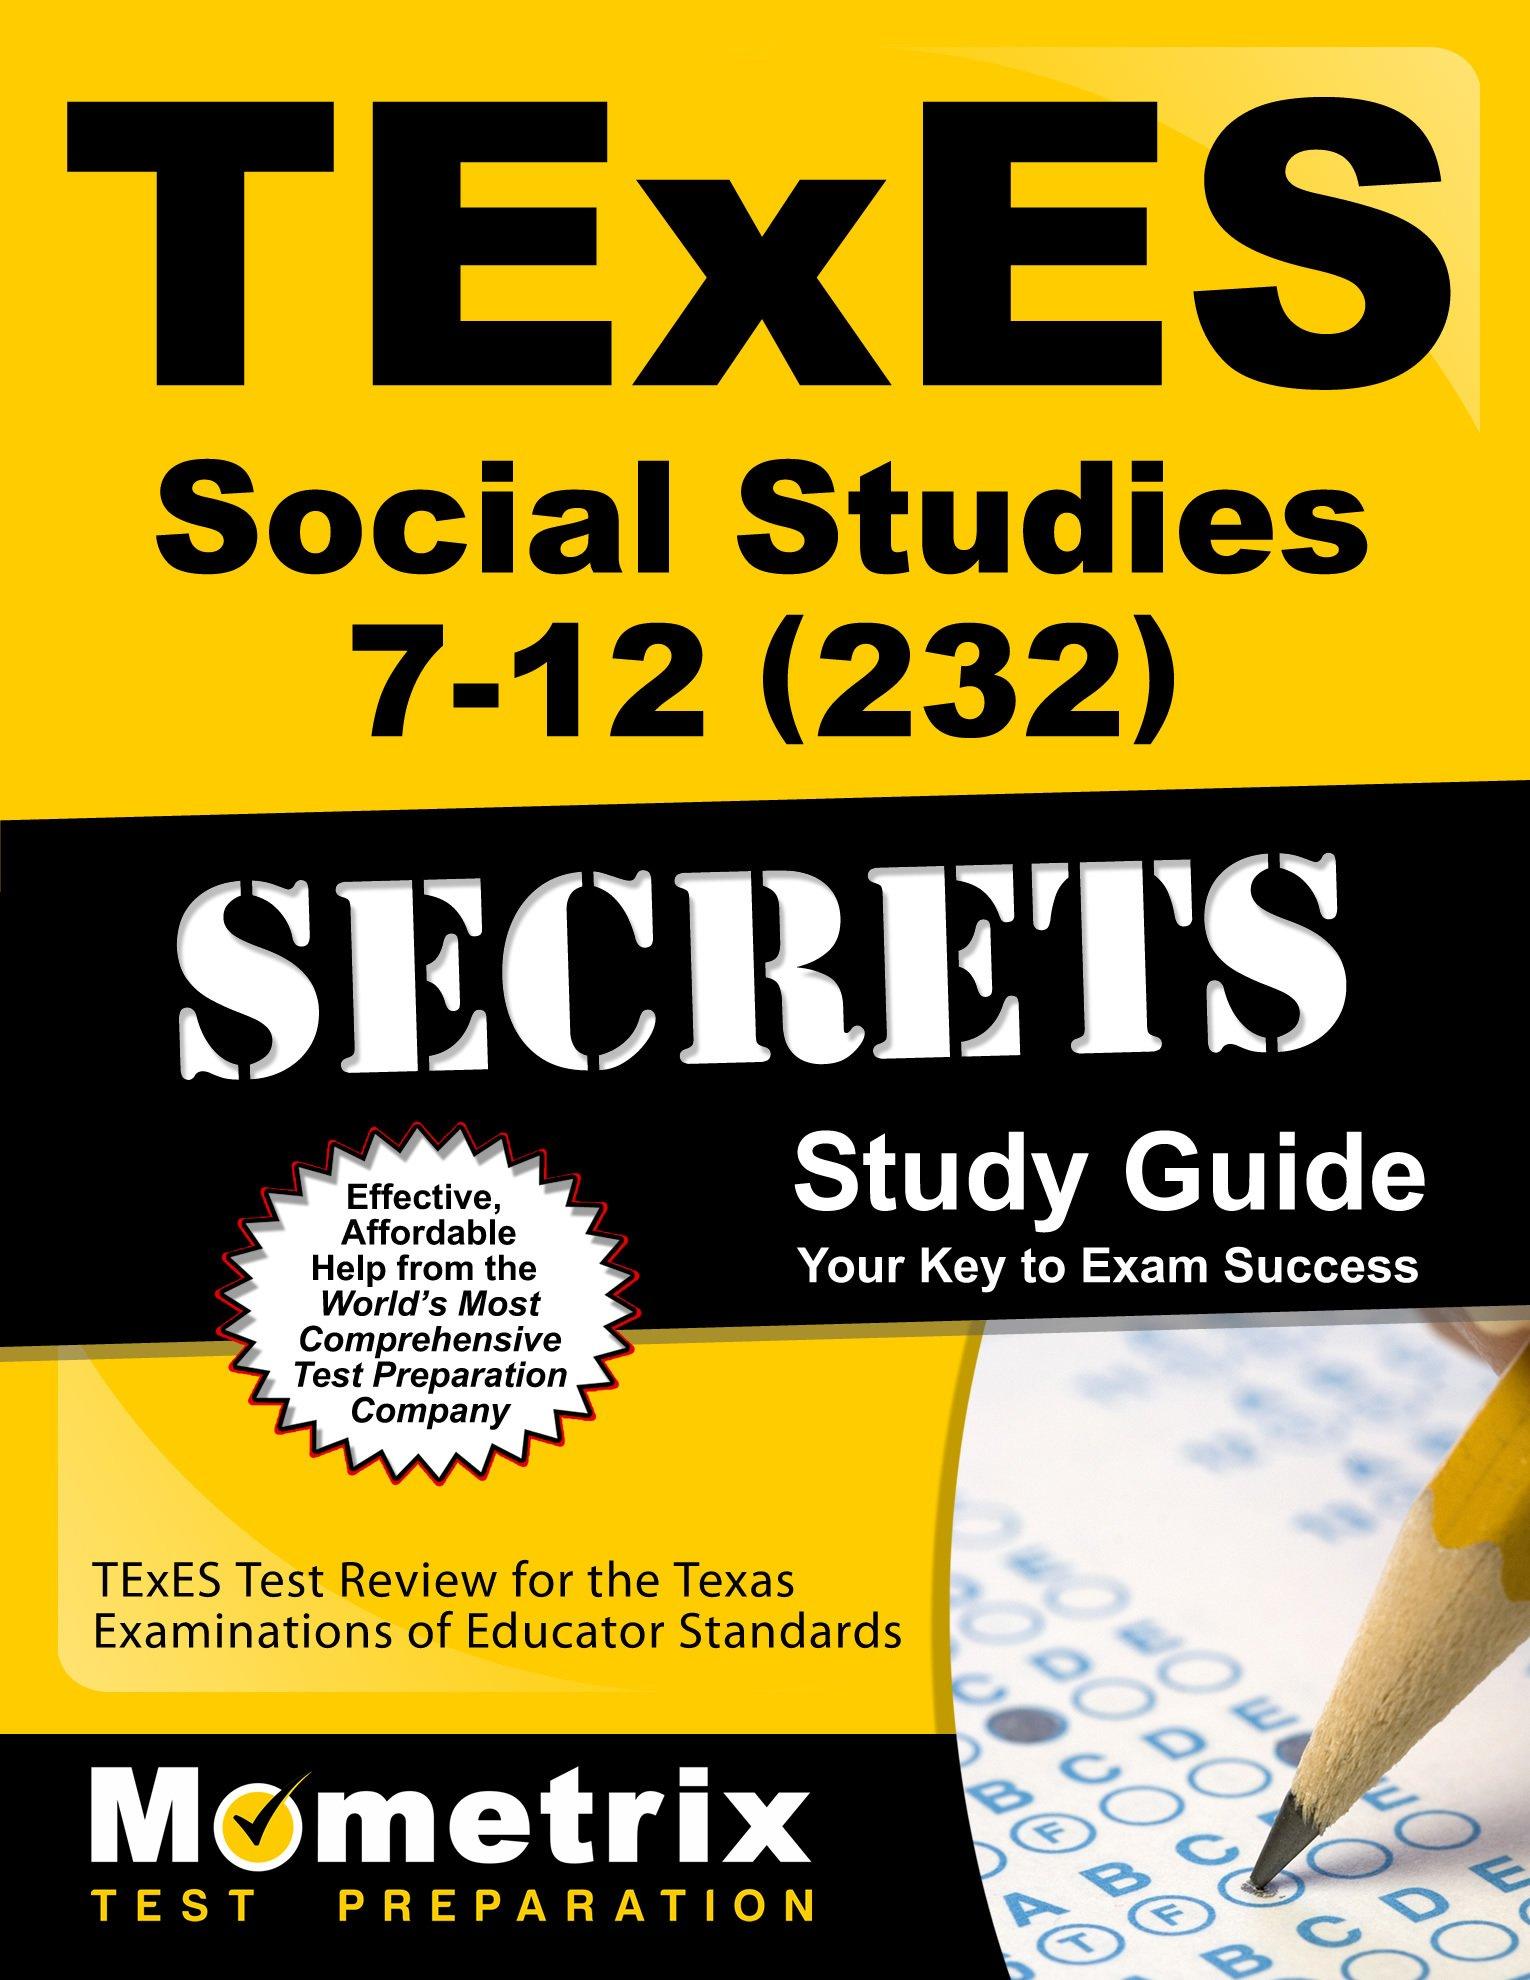 TExES Social Studies Secrets Study product image